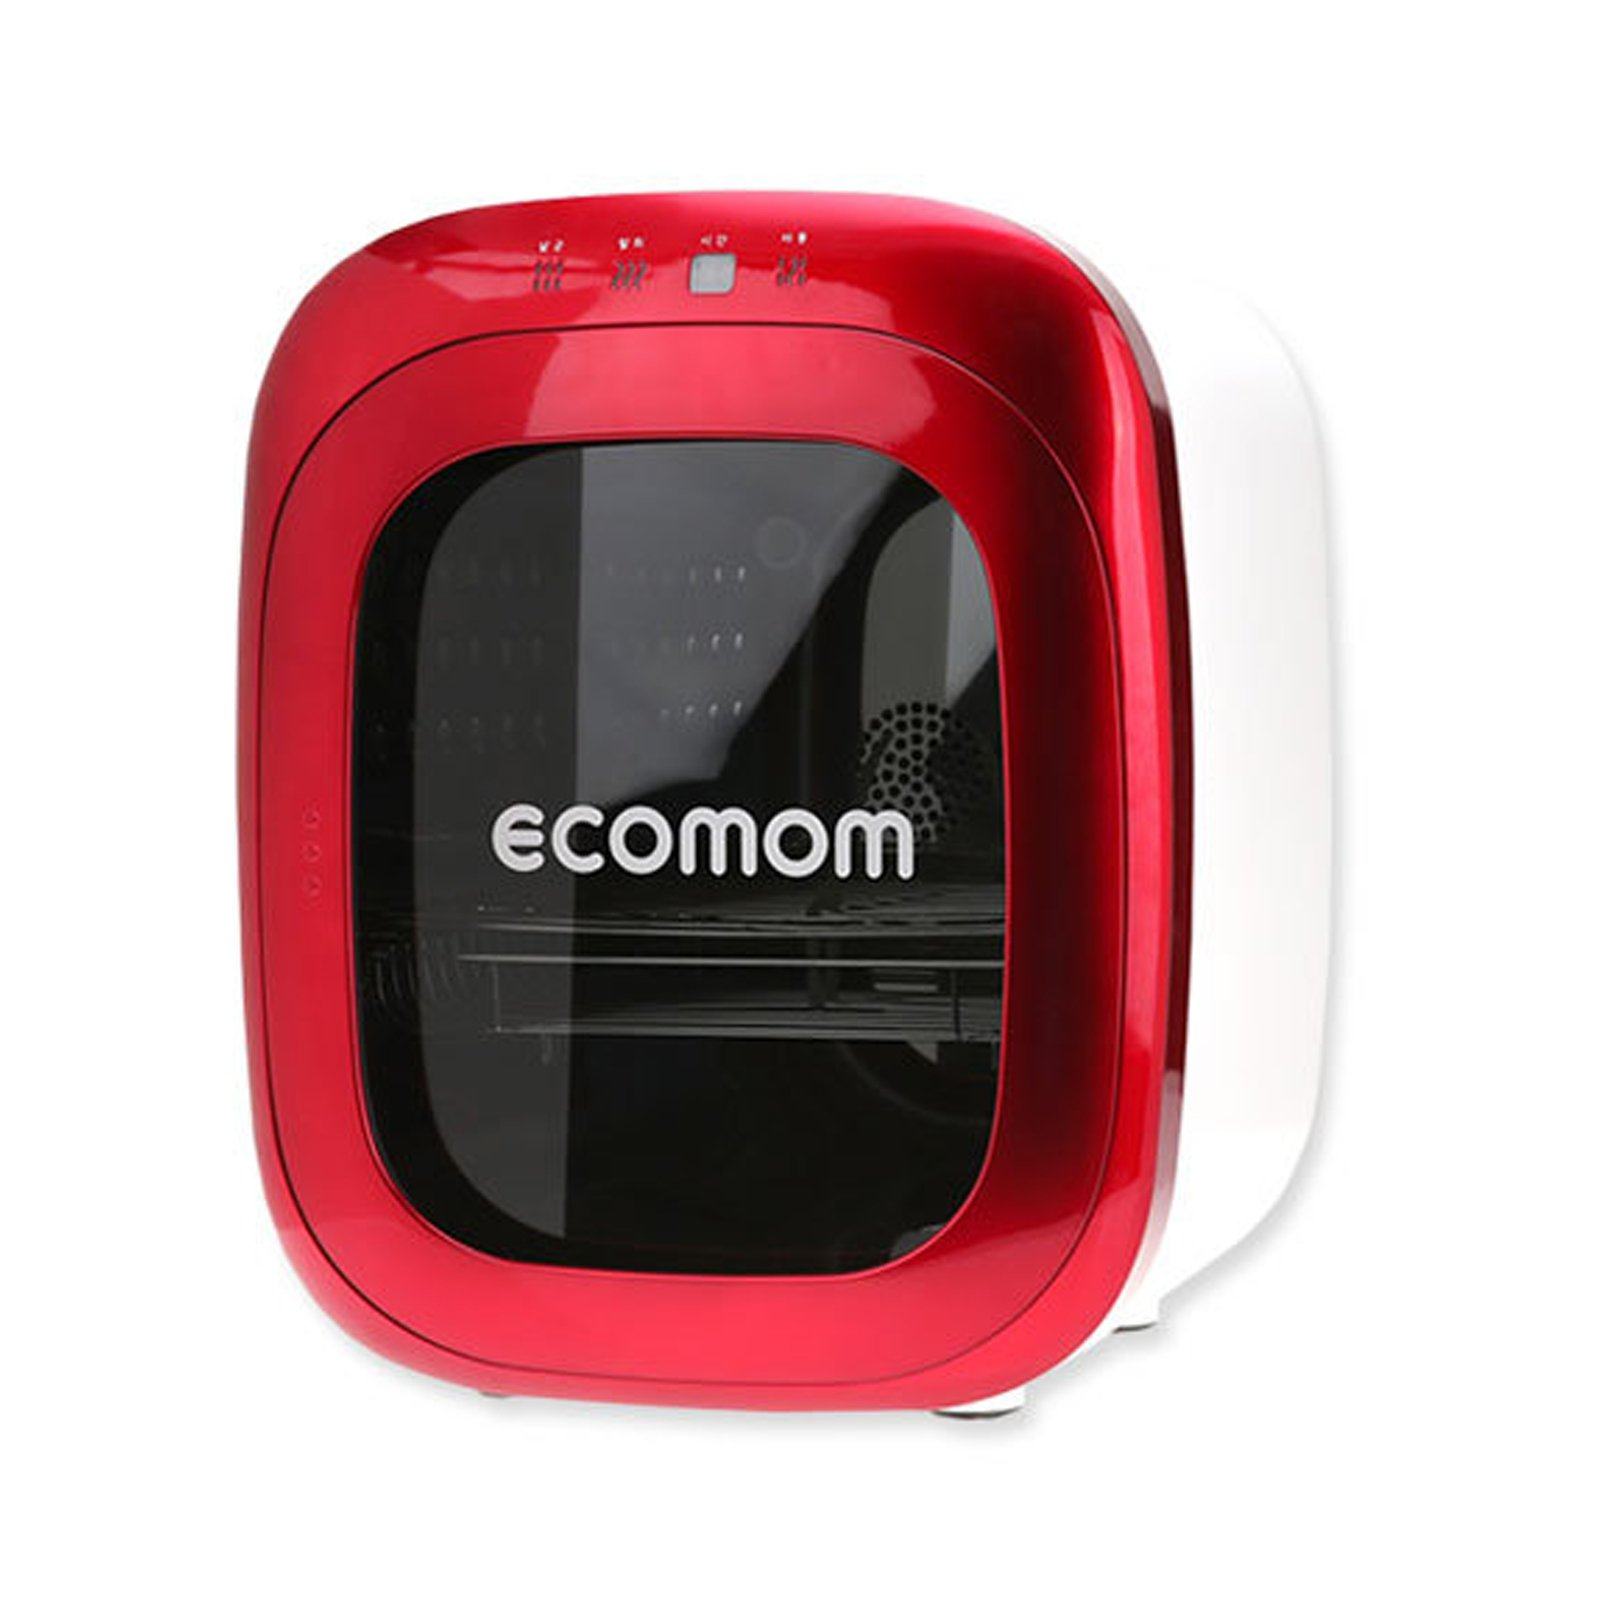 ECOMOM ECO-70KA Luxury Baby Bottle Sterilizer Ultraviolet Anion Deodorant 220V (Red)